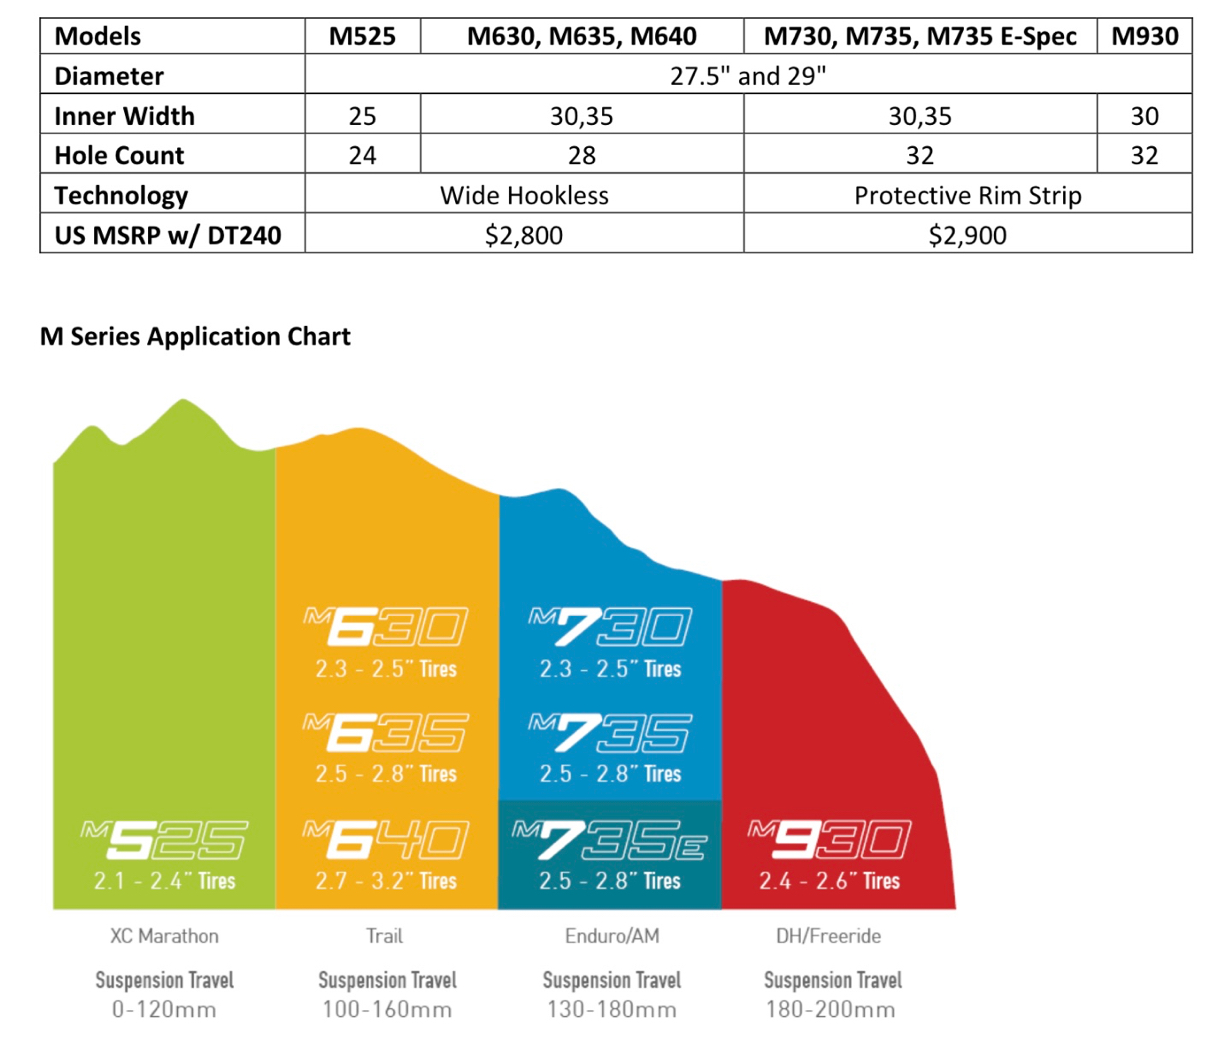 ENVE M Series Models & Application Chart